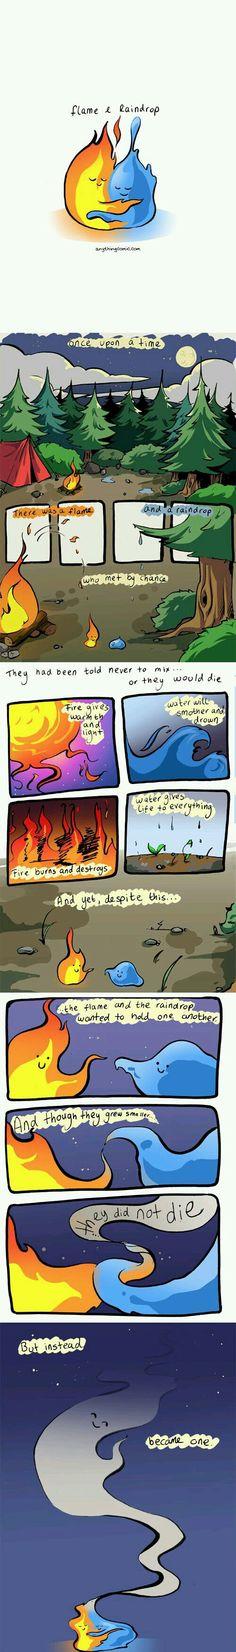 Flame and raindrop